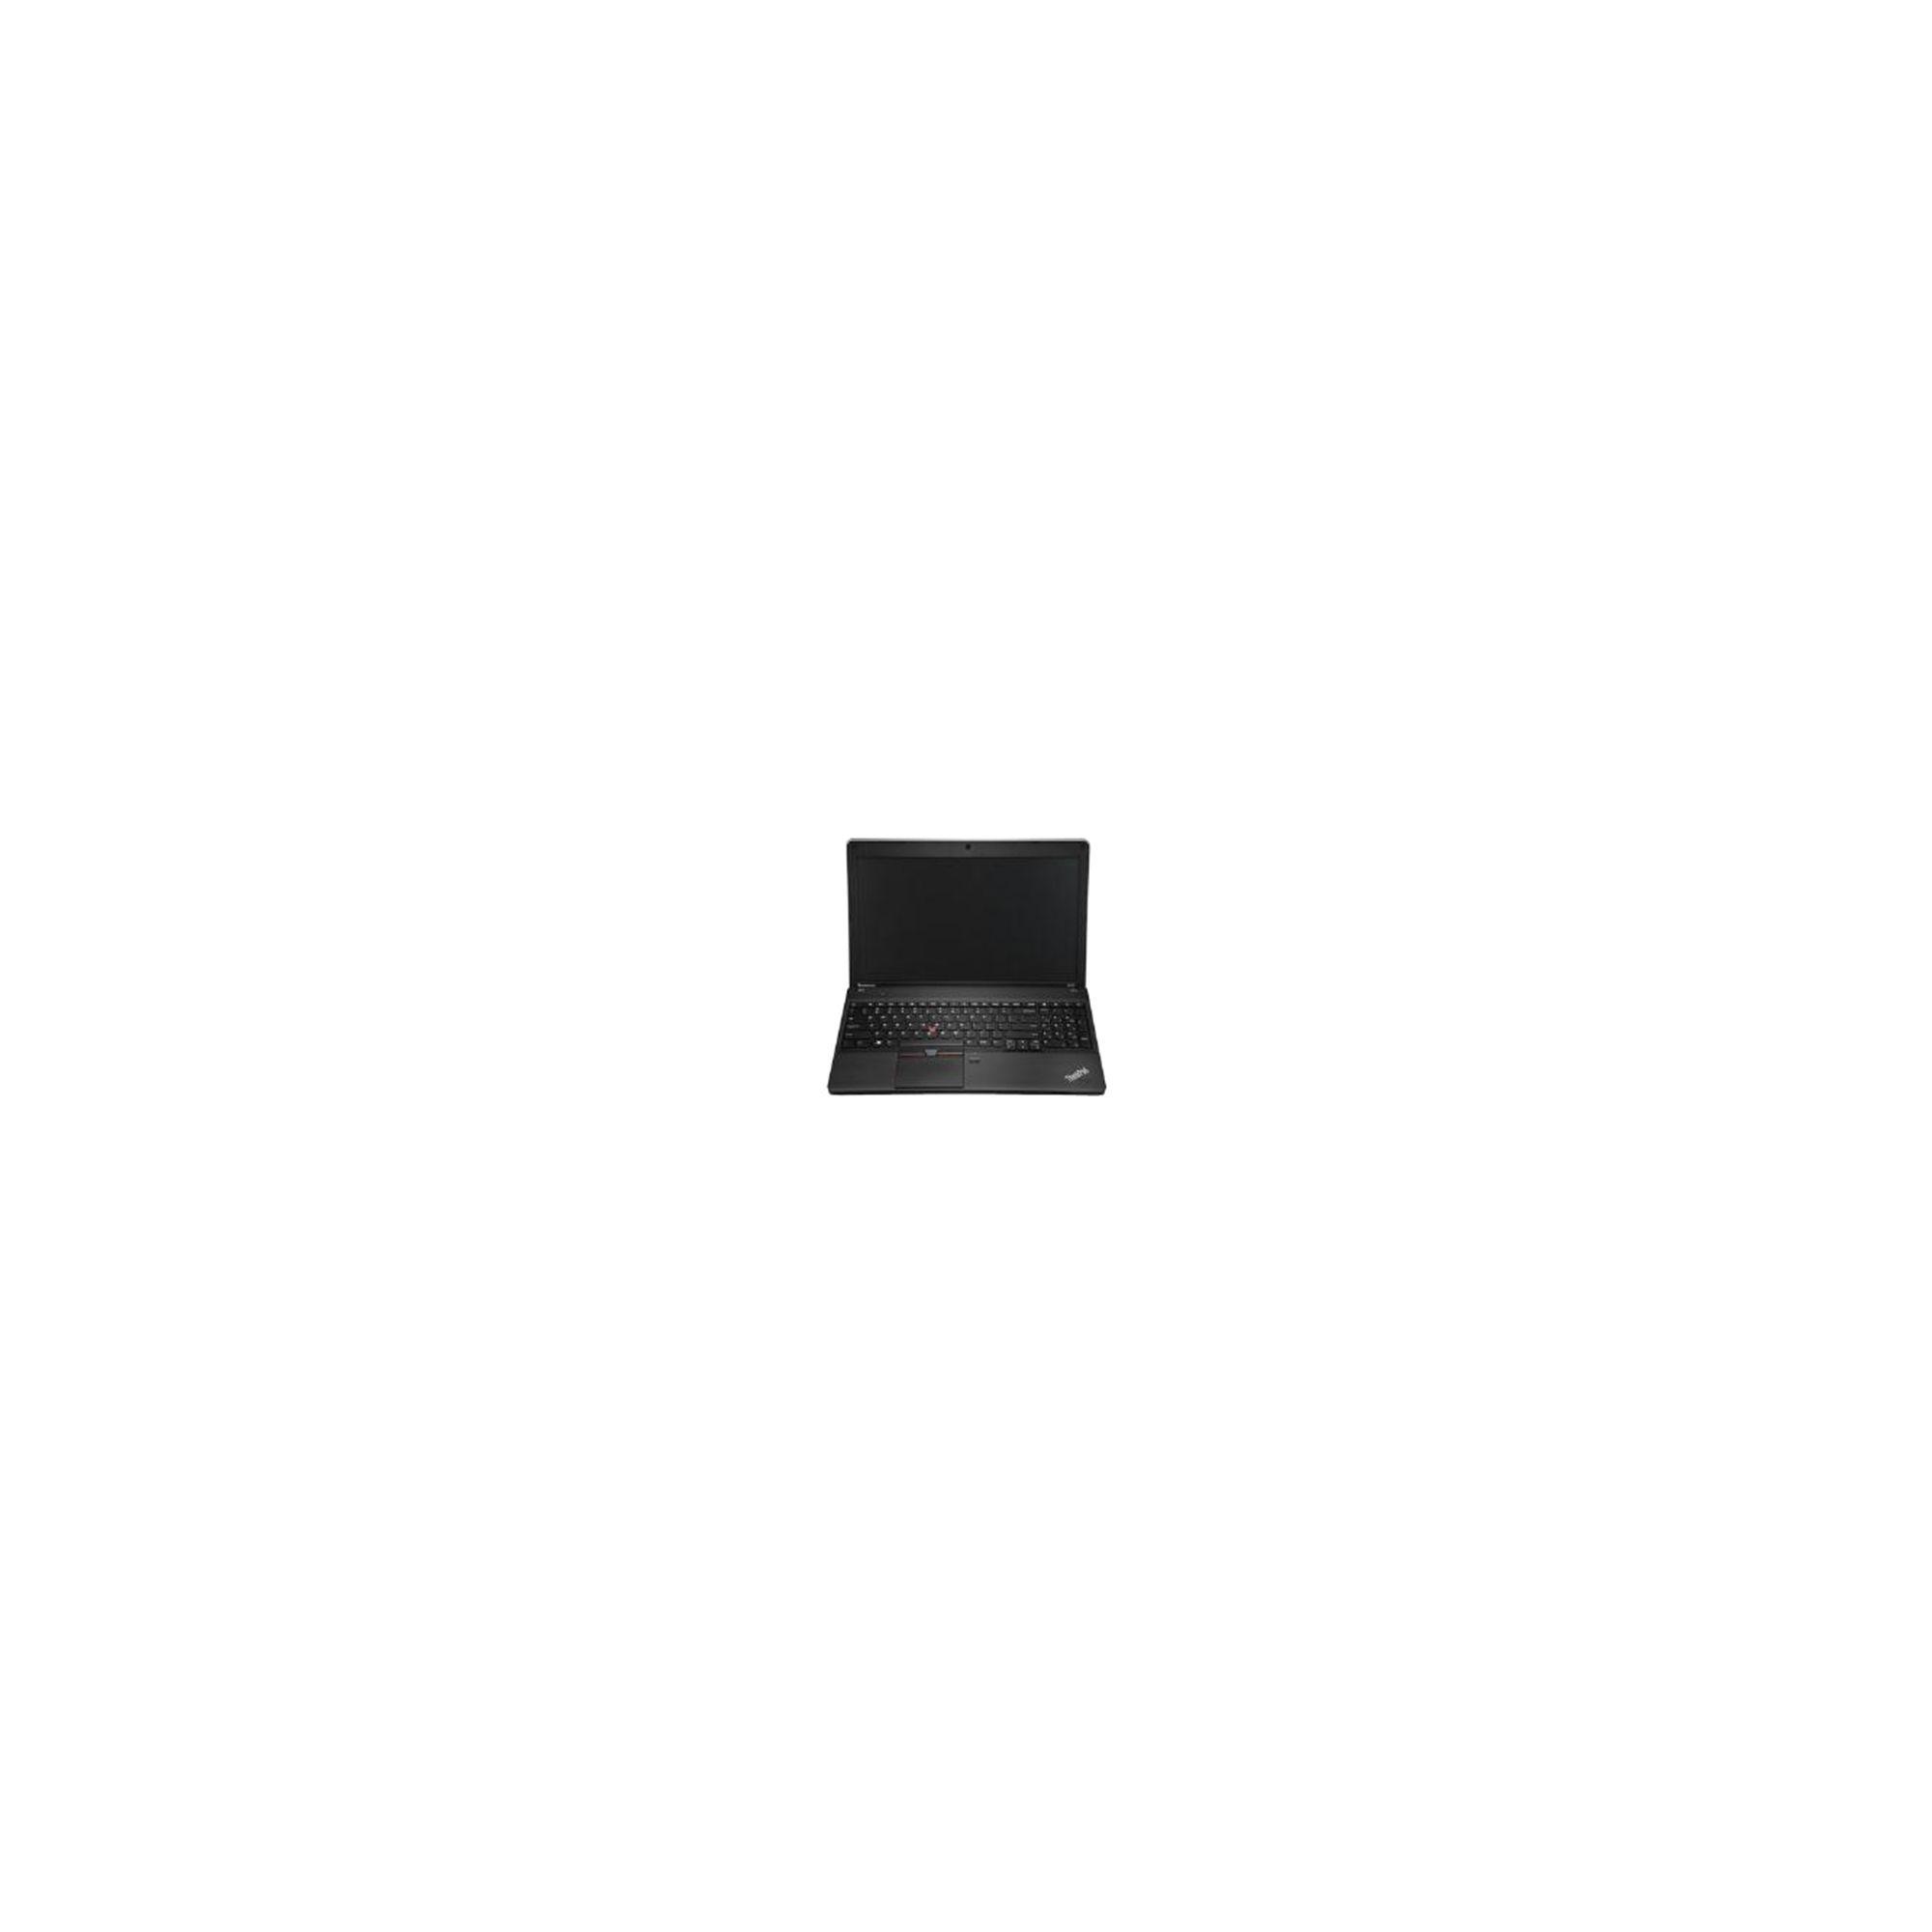 Lenovo ThinkPad Edge E530 627249G (15.6 inch) Notebook Core i5 (3210M) 2.5GHz 4GB 750GB DVD±RW WLAN BT Webcam Windows 7 Pro 64-bit/Windows 8 Pro at Tesco Direct